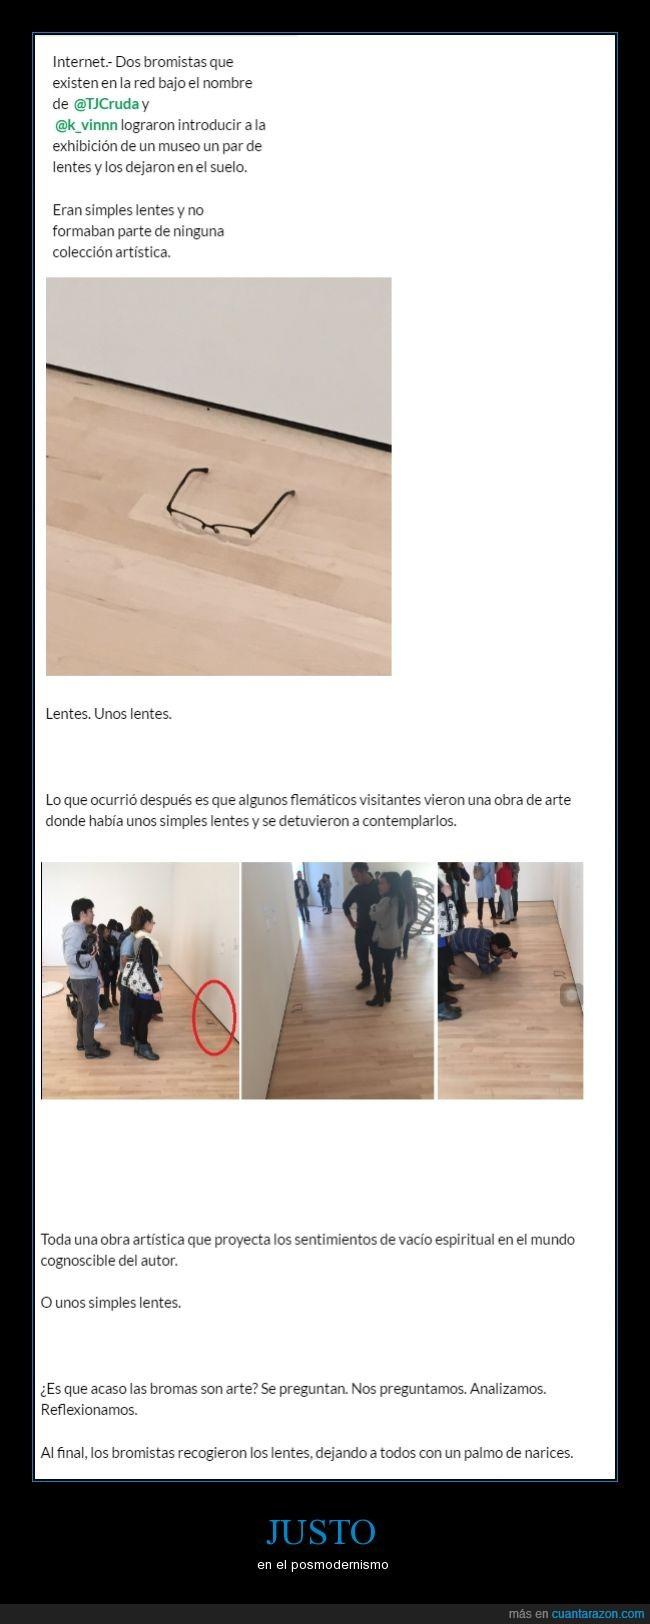 arte,broma,lentes,museo,posmodernismo,que paso con el arte